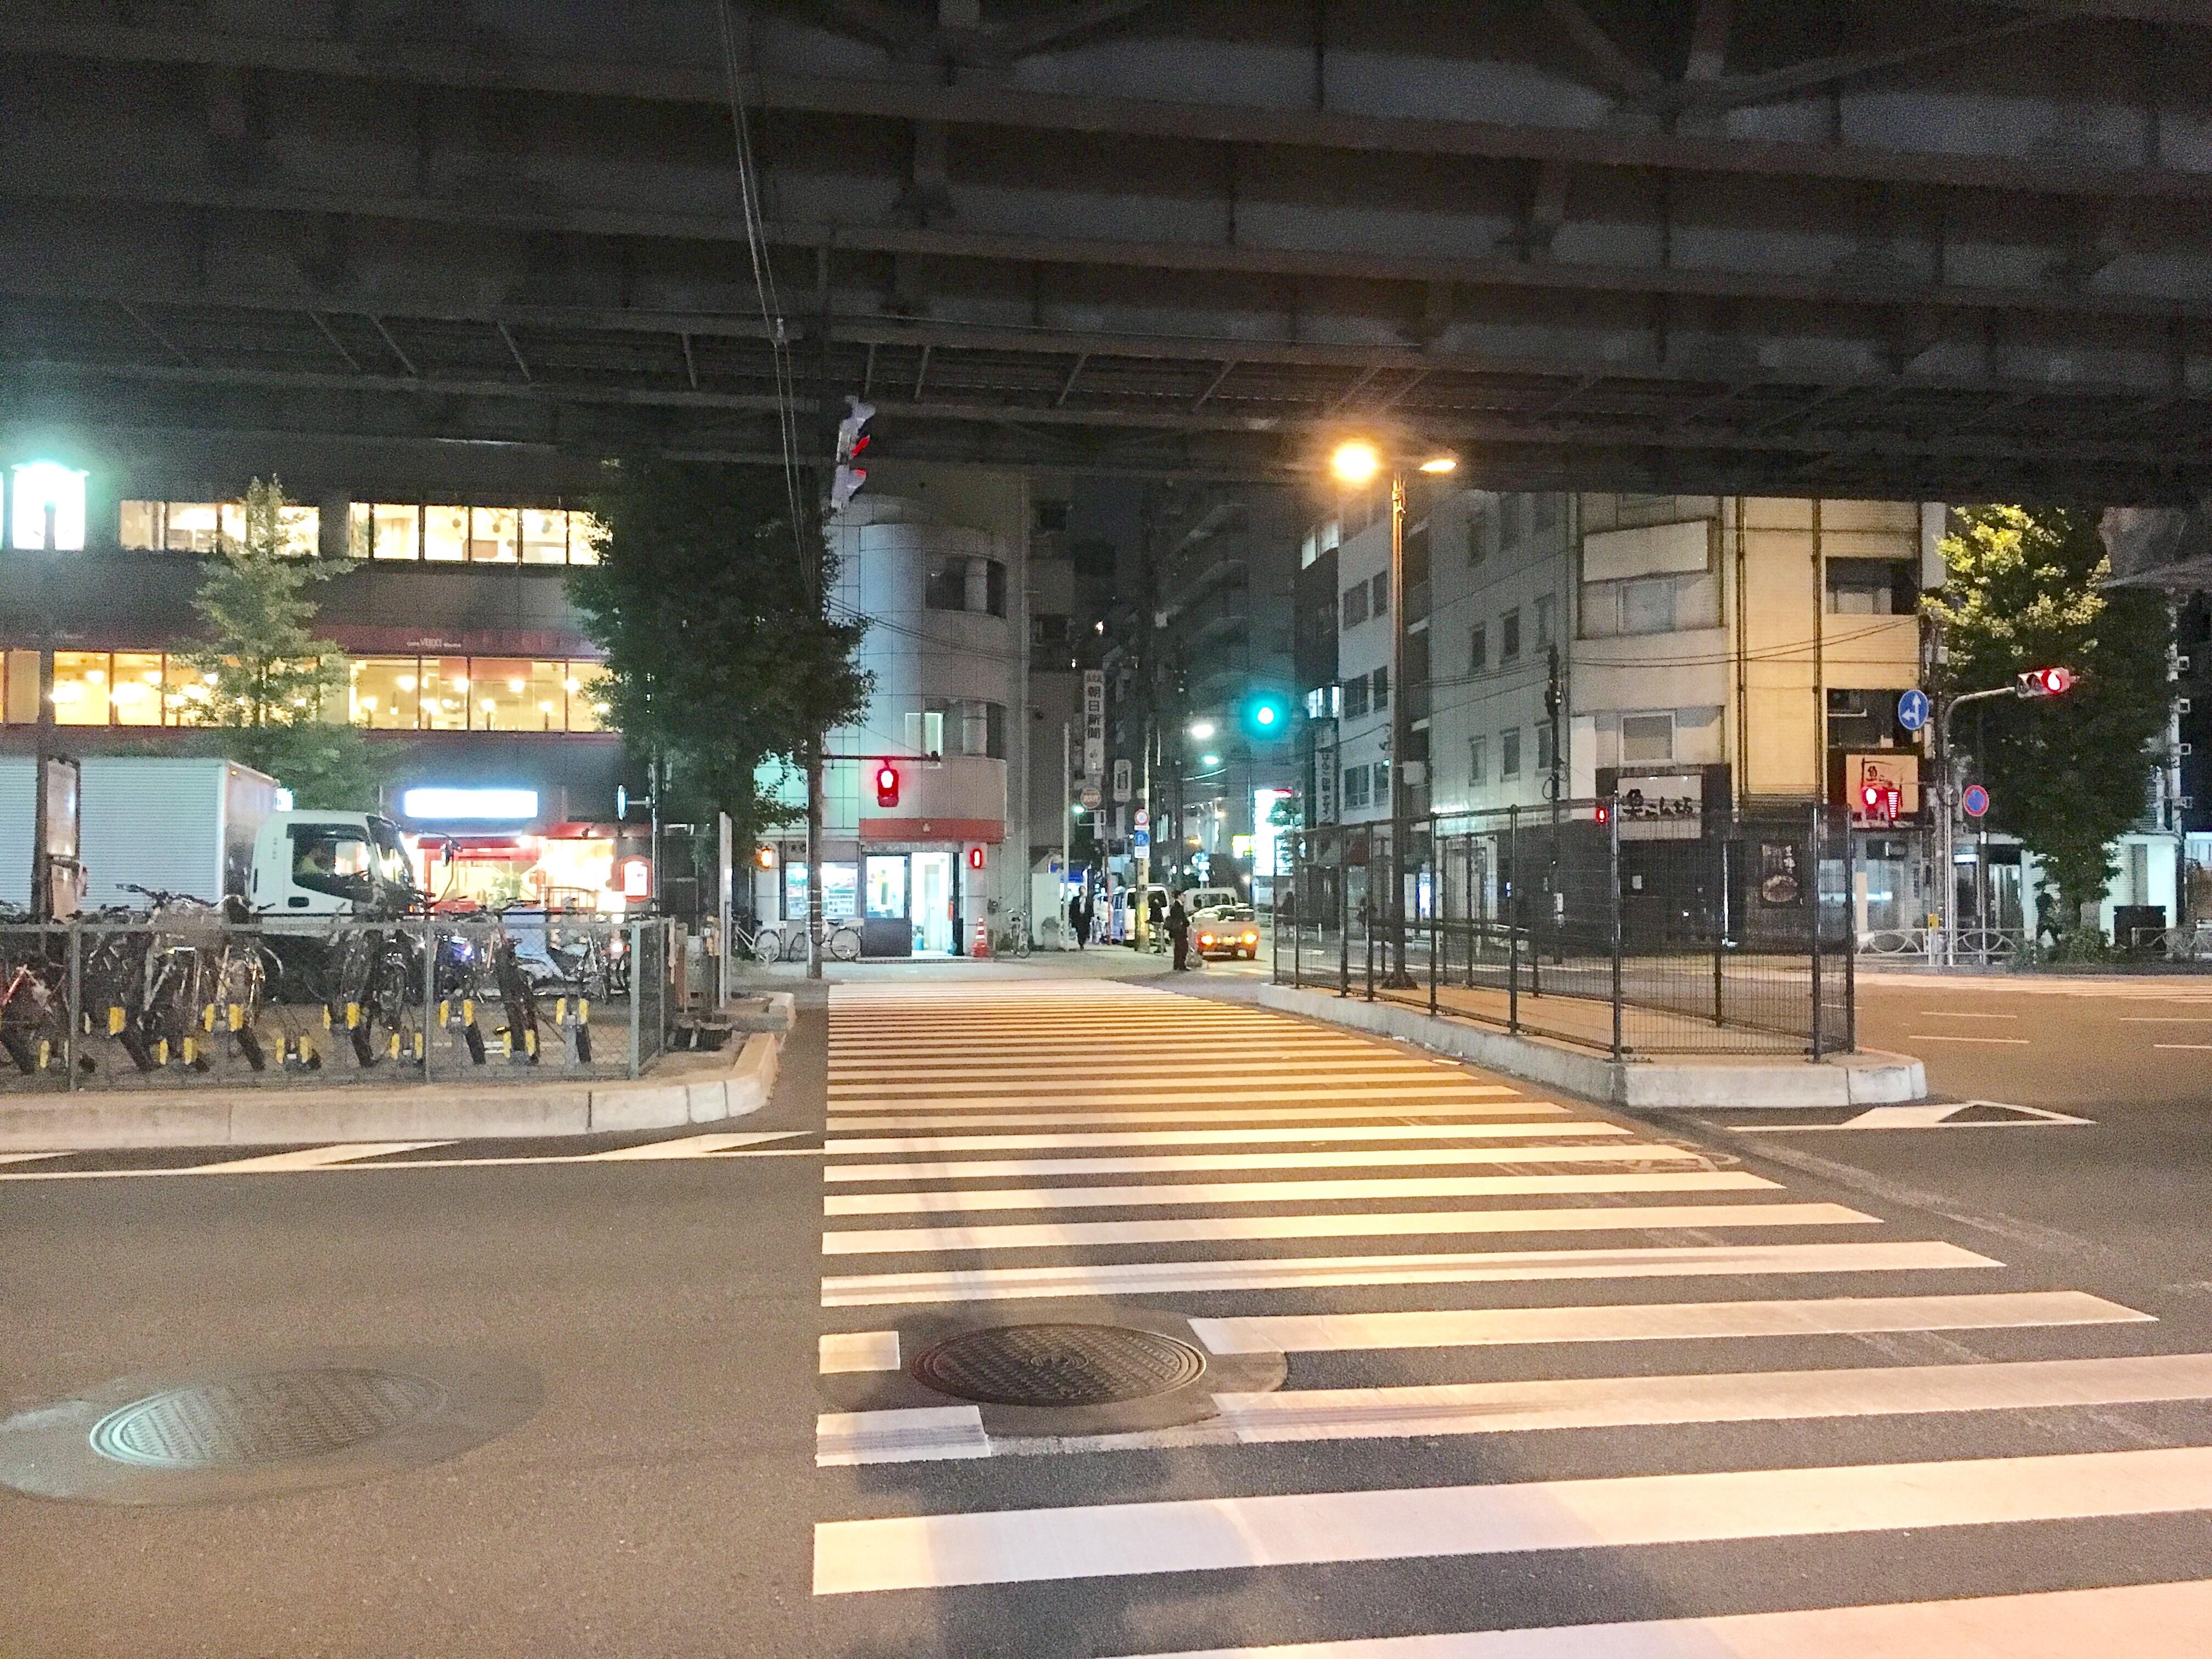 f:id:SoichiroIkeshita:20170606154448j:image